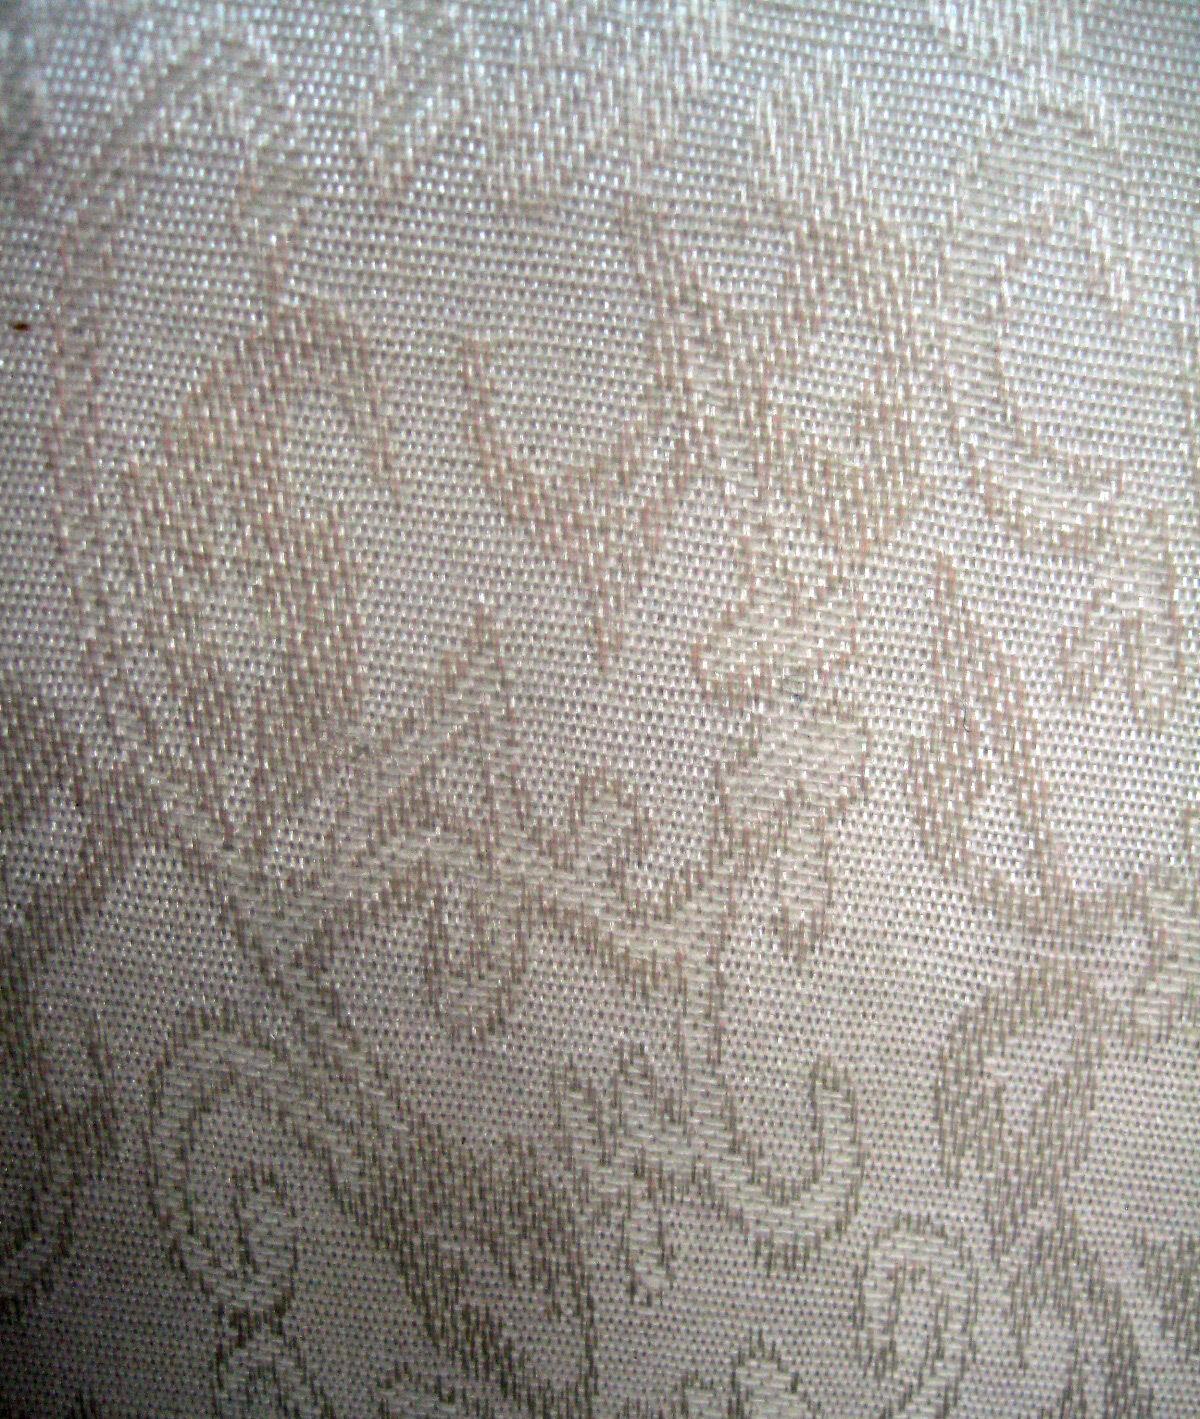 Asiatisches rollbild wanddeko tuschmalerei kranich for Asiatische wanddeko